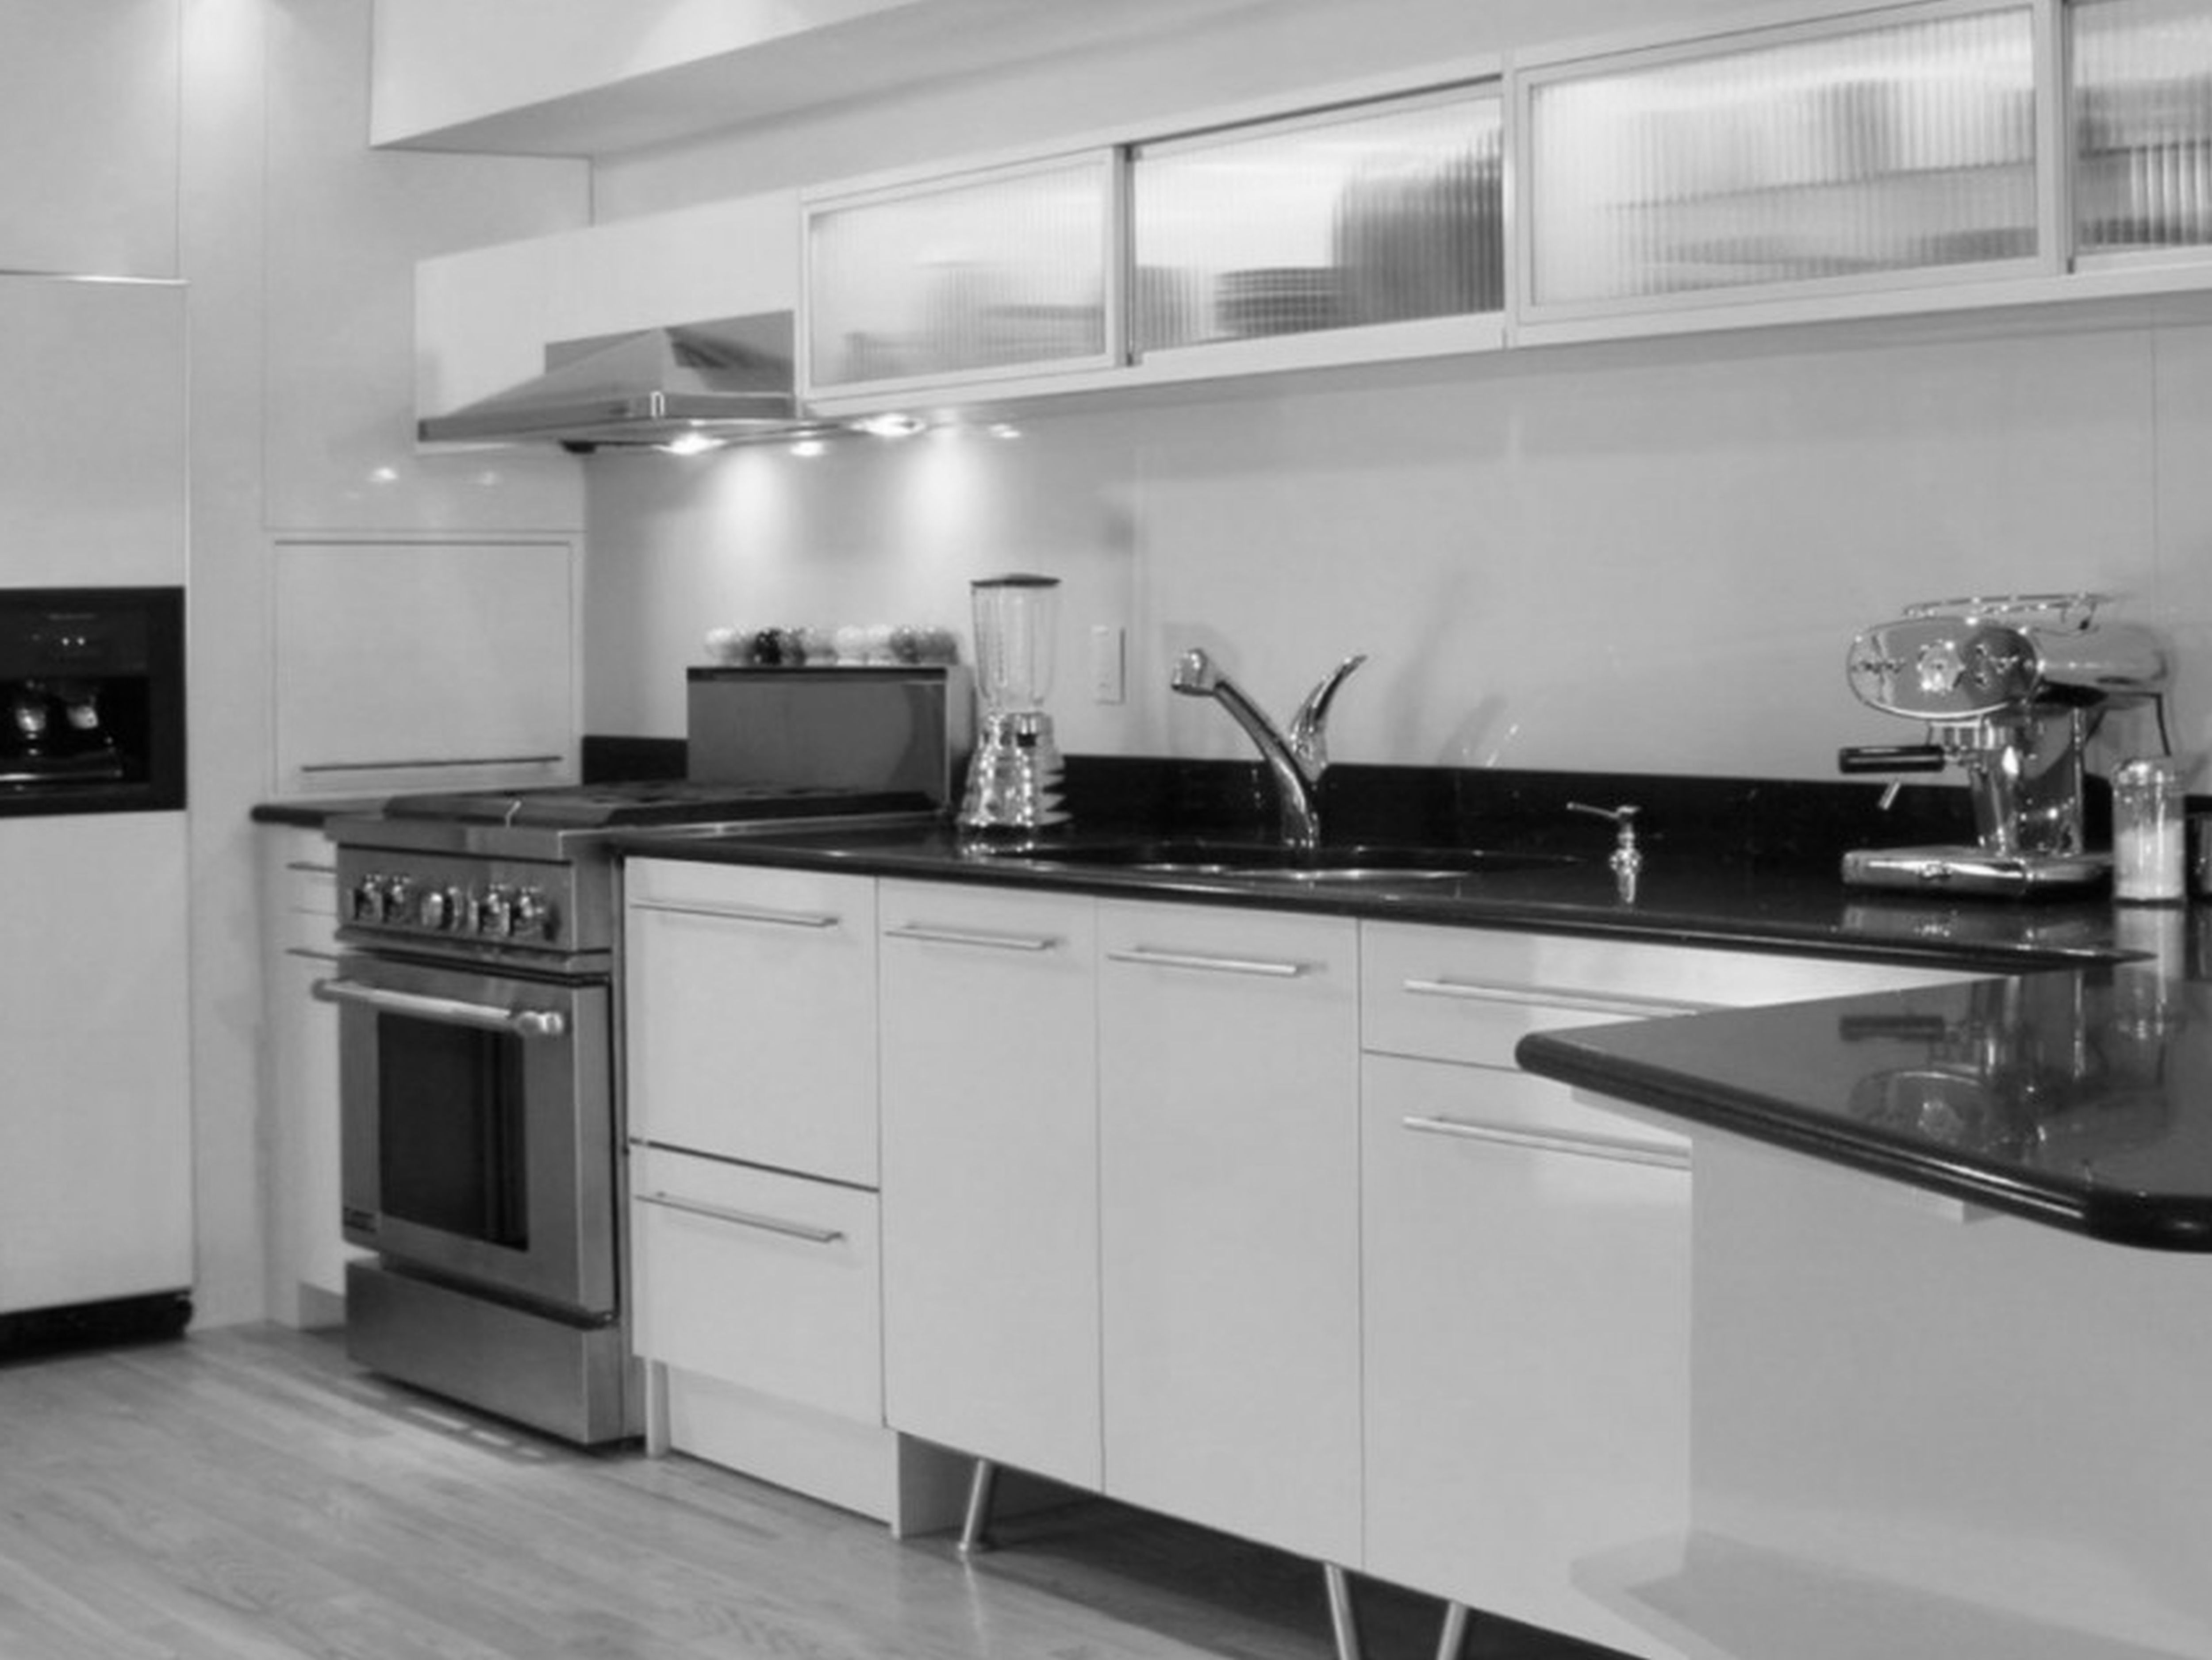 Best Kitchen Gallery: Modern White Gloss Kitchen Cabi S Sodakaustica of Modern White Gloss Kitchen Cabinets on rachelxblog.com